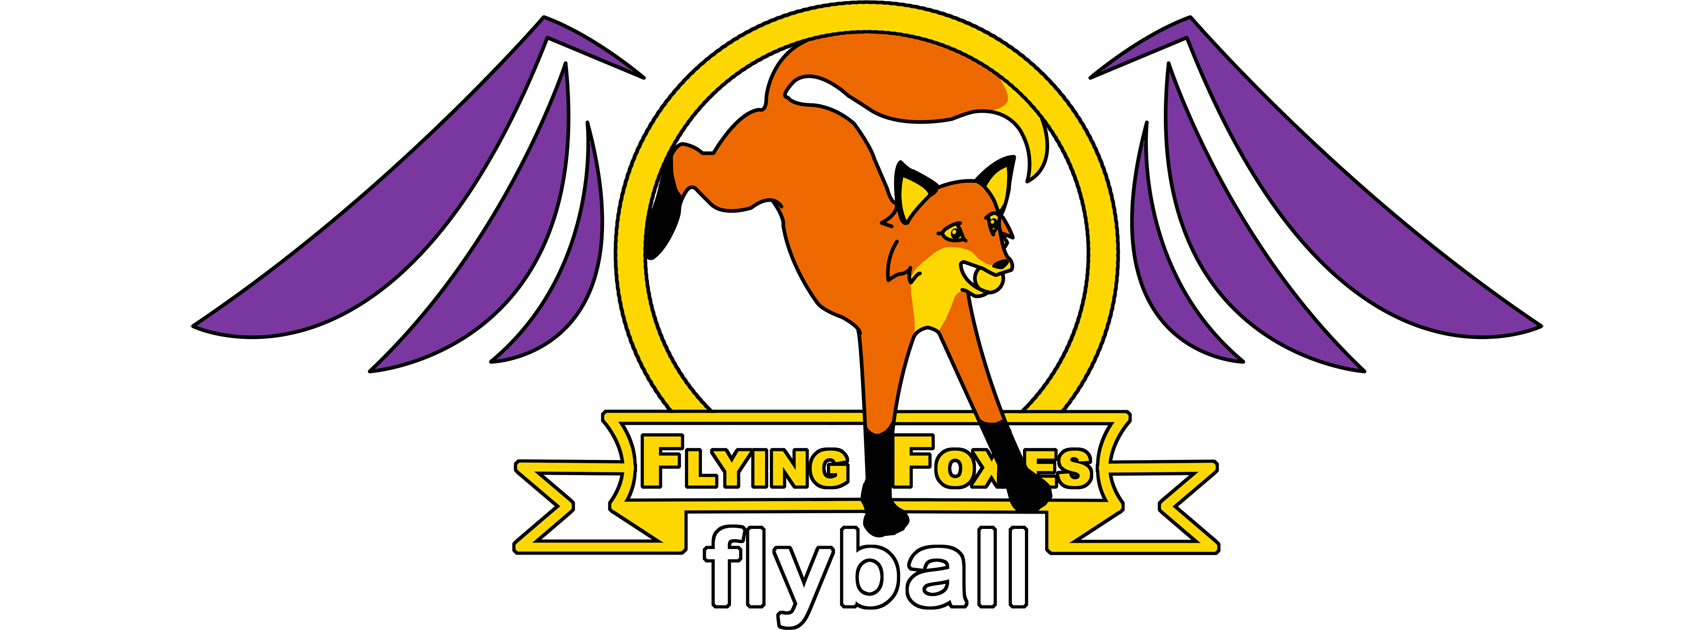 Flying Fox Flyball Team